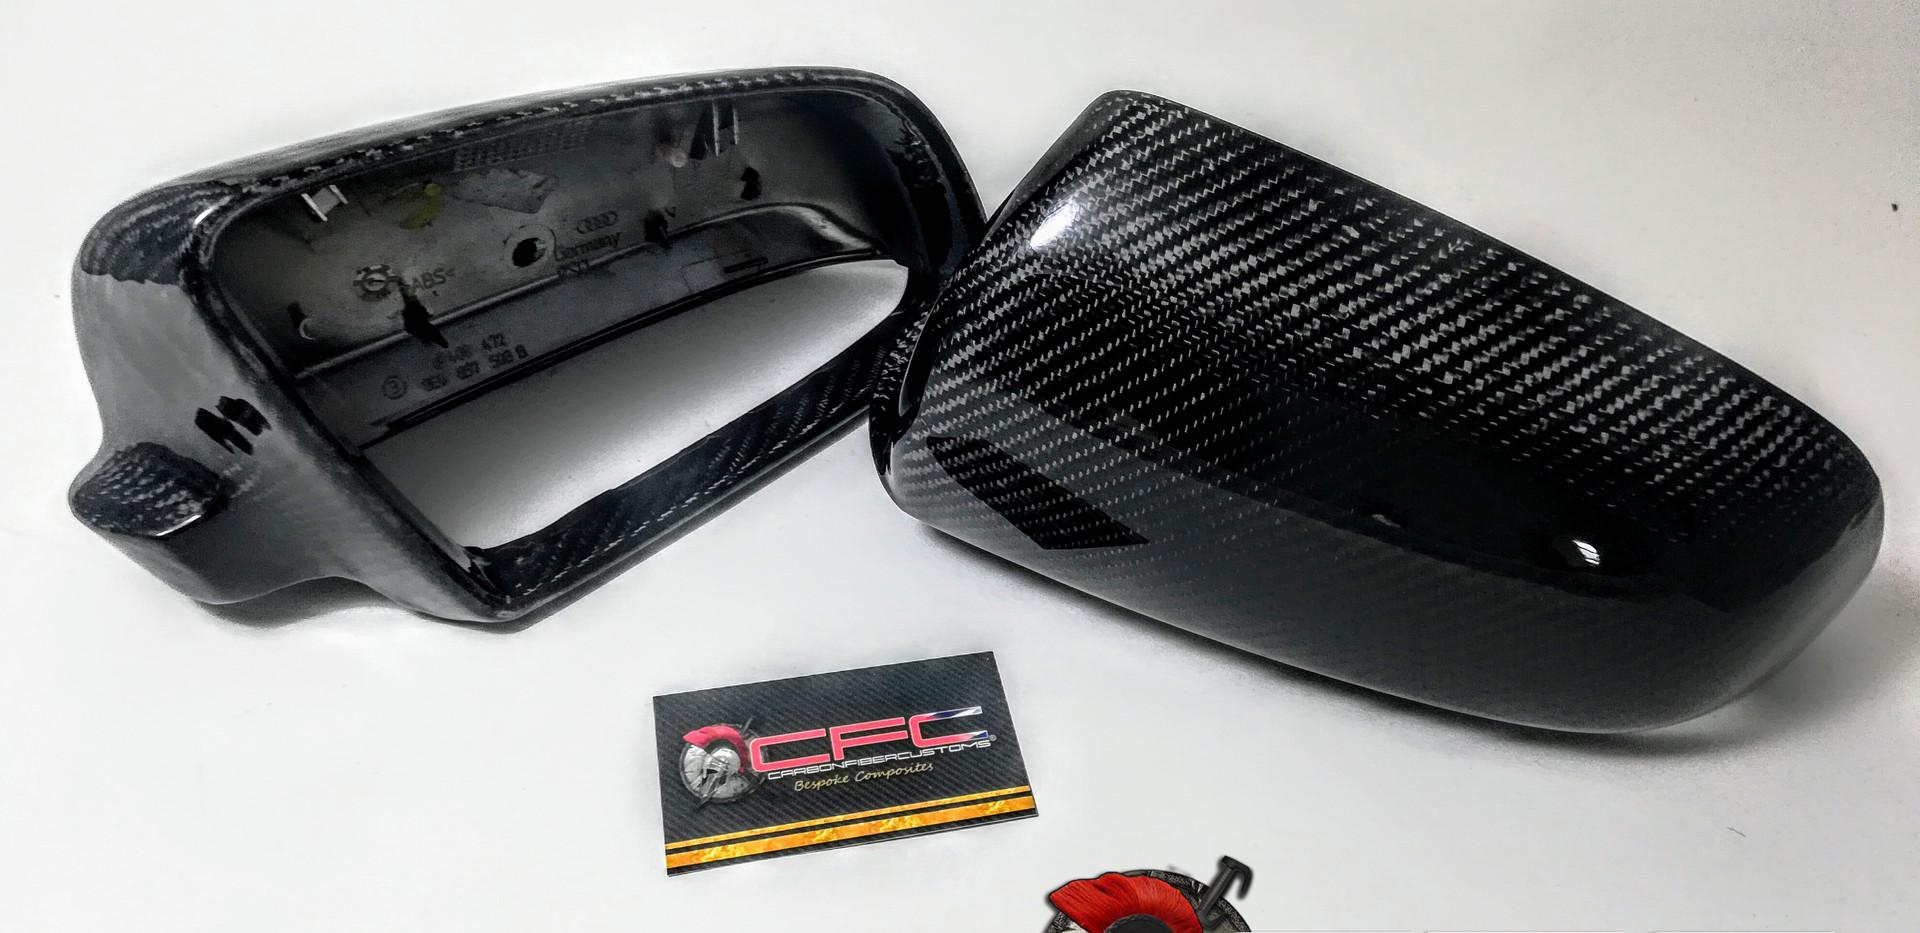 Yamaha Tmax 530 Tachometer Audi S3 Mirrors Carbon Fiber Skinning by CFC